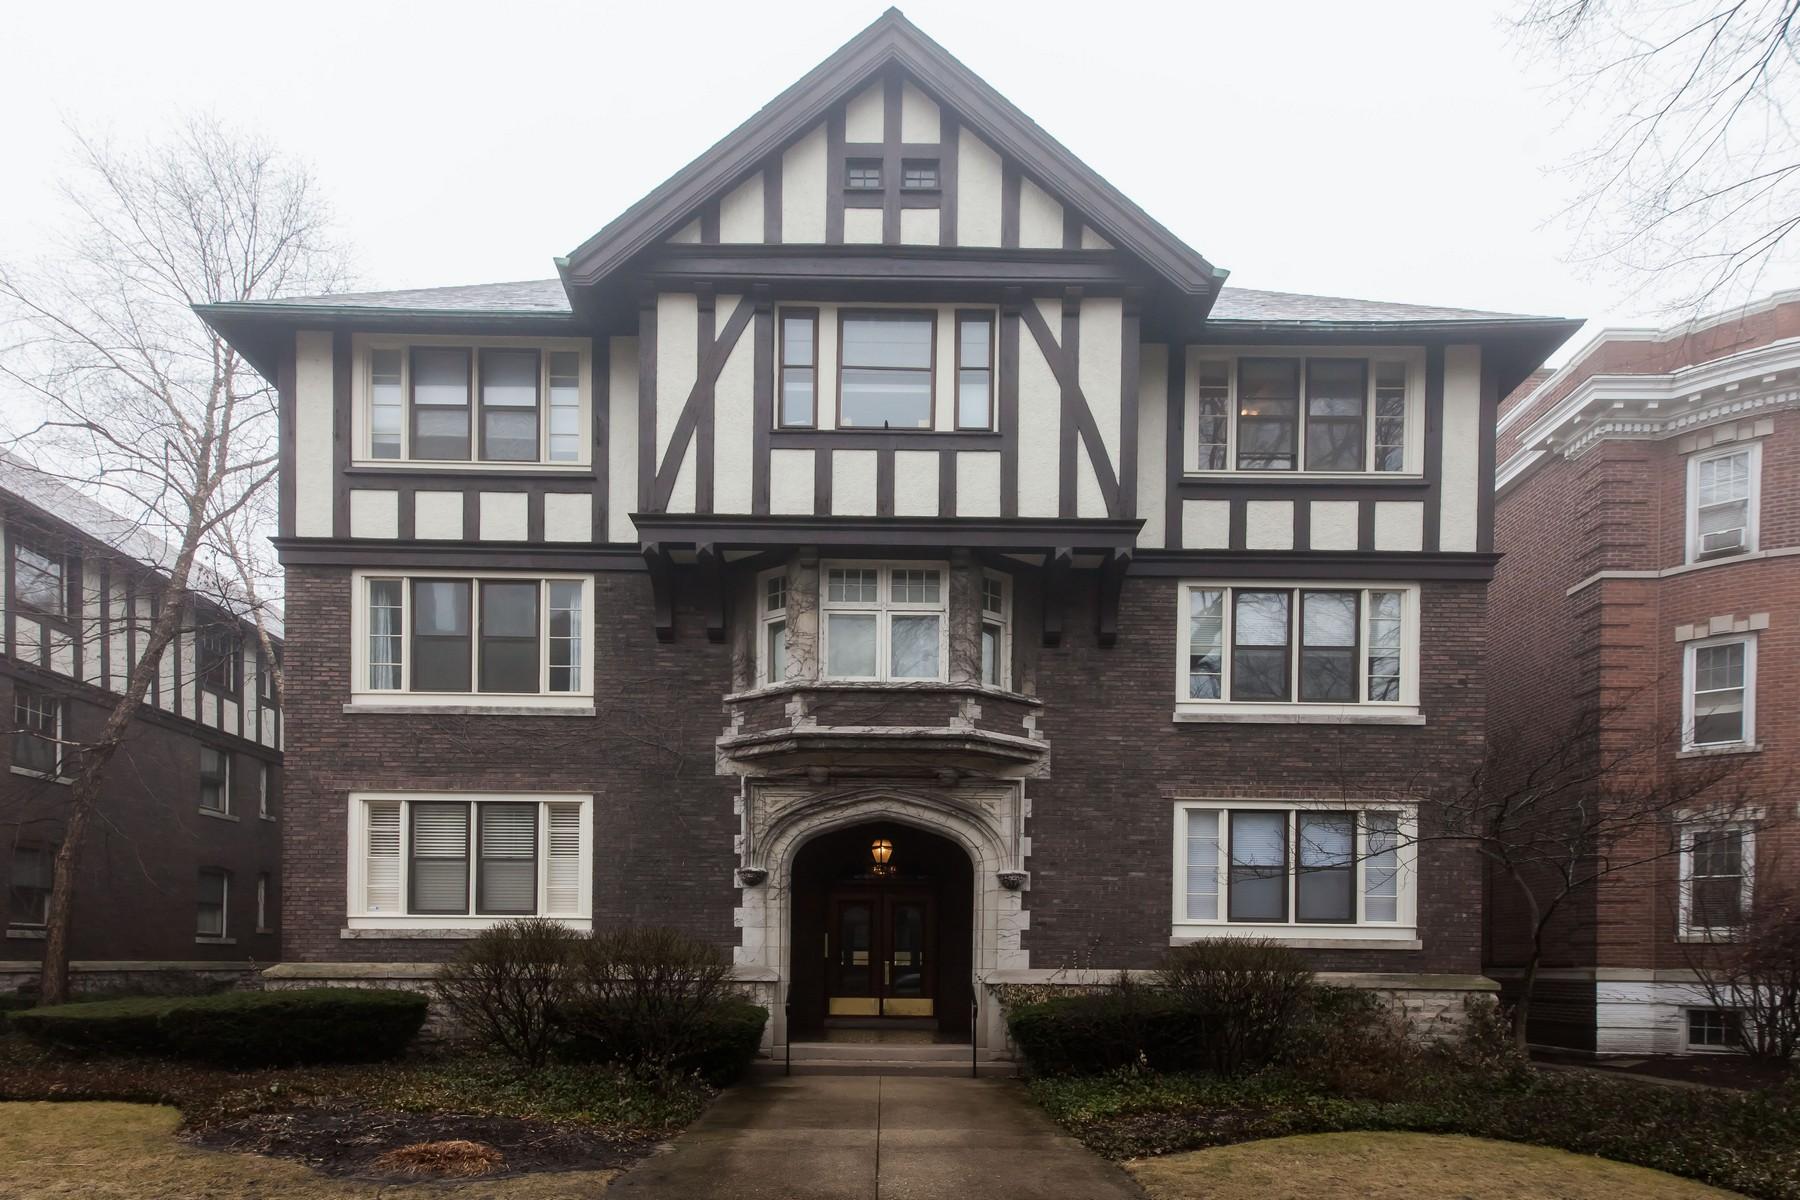 Single Family Home for Sale at Spacious Vintage Evanson Condo 1633 Hinman Avenue Unit 3S Evanston, Illinois, 60201 United States